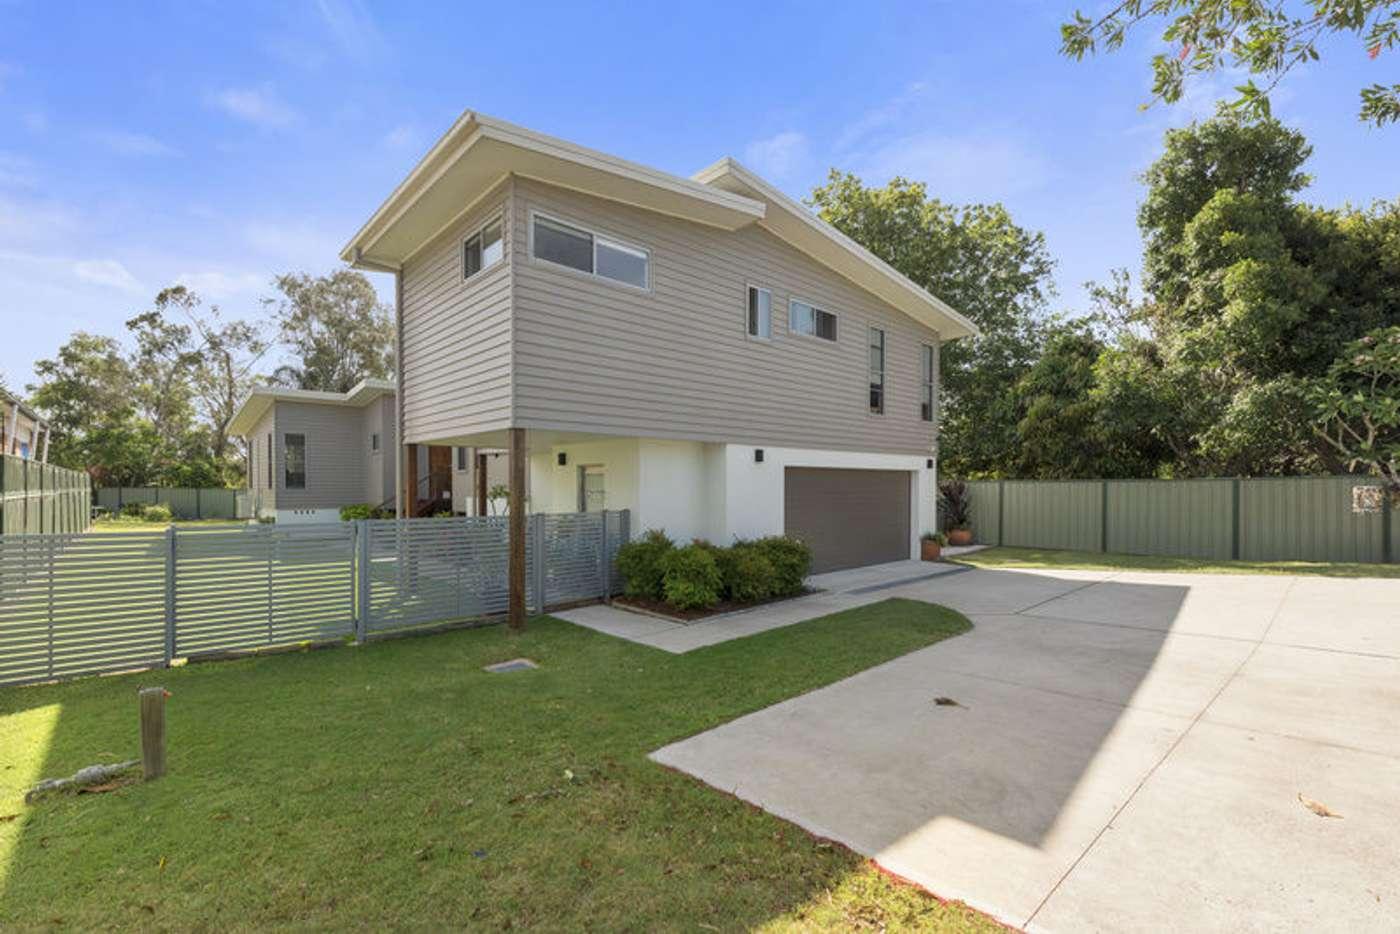 Main view of Homely house listing, 4419 Giinagay Way, Urunga NSW 2455